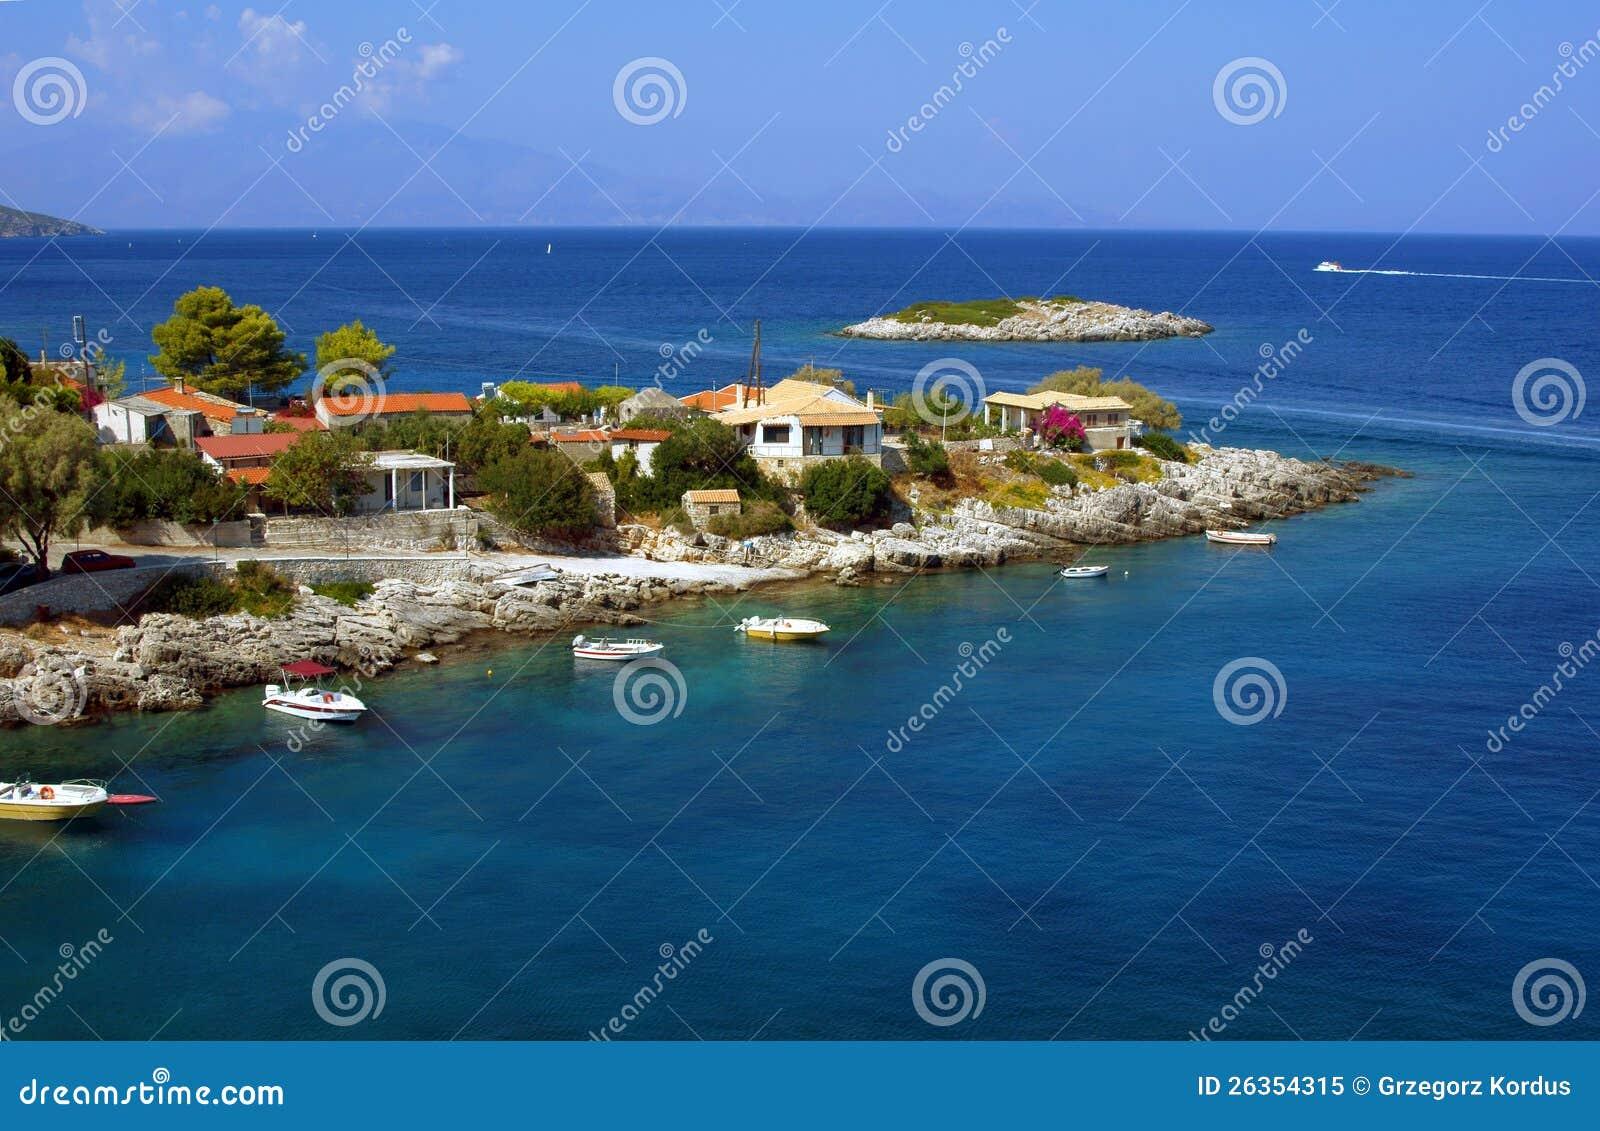 Dorf auf Halbinsel